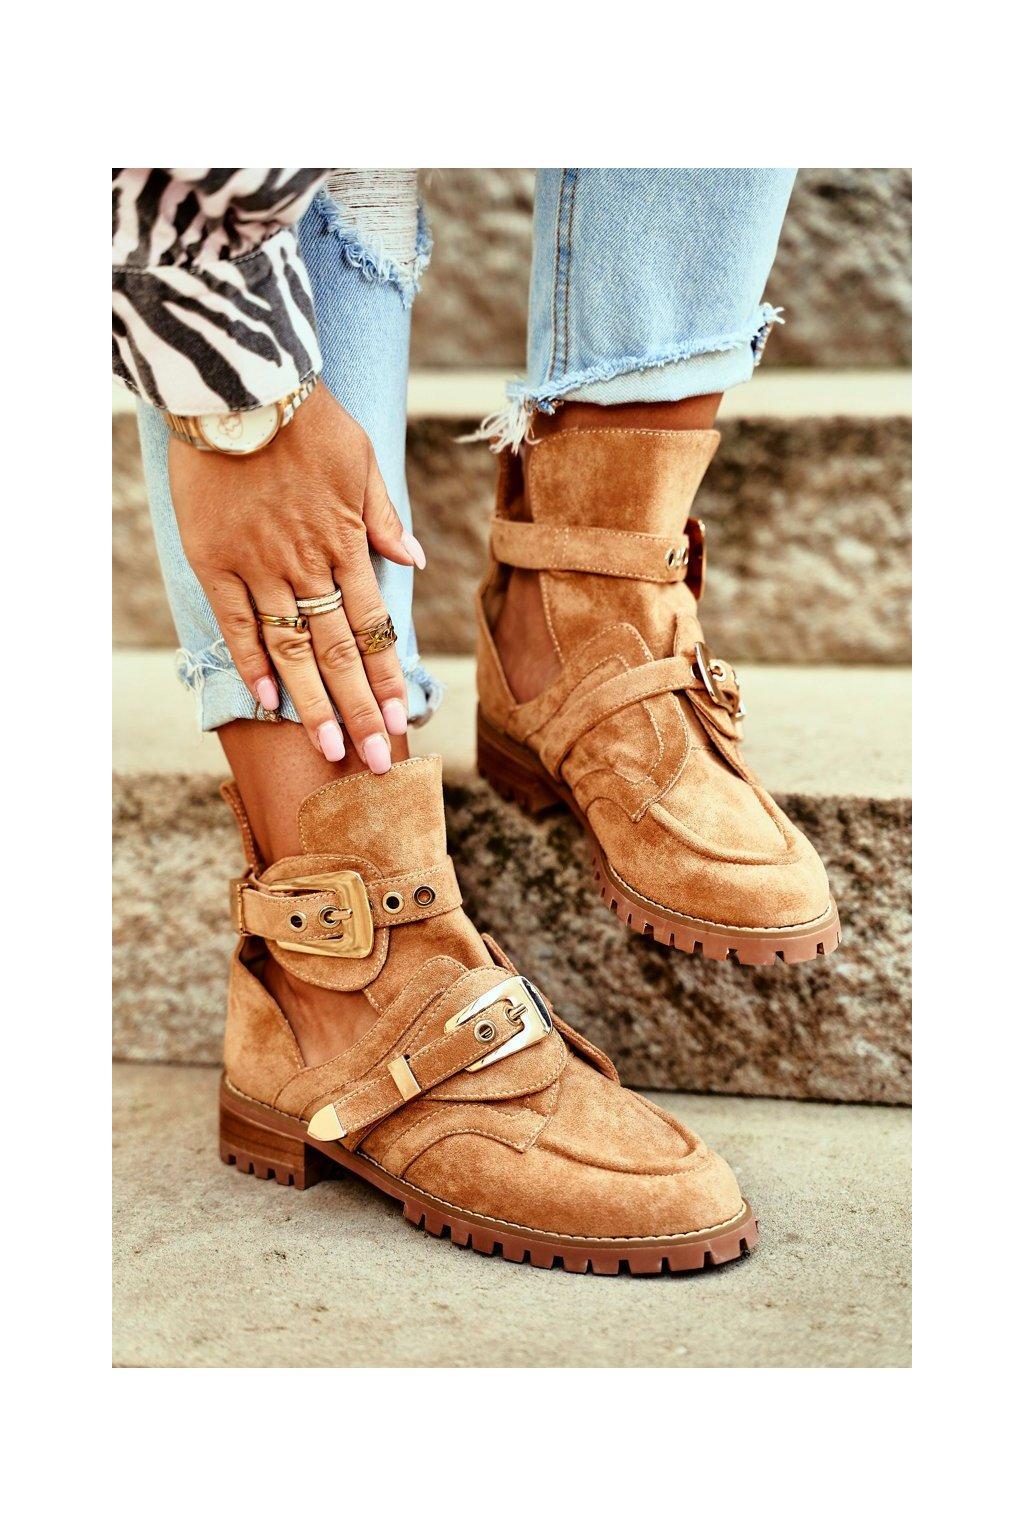 Členkové topánky na podpätku farba hnedá NJSK XW37266 CAMEL SUEDE